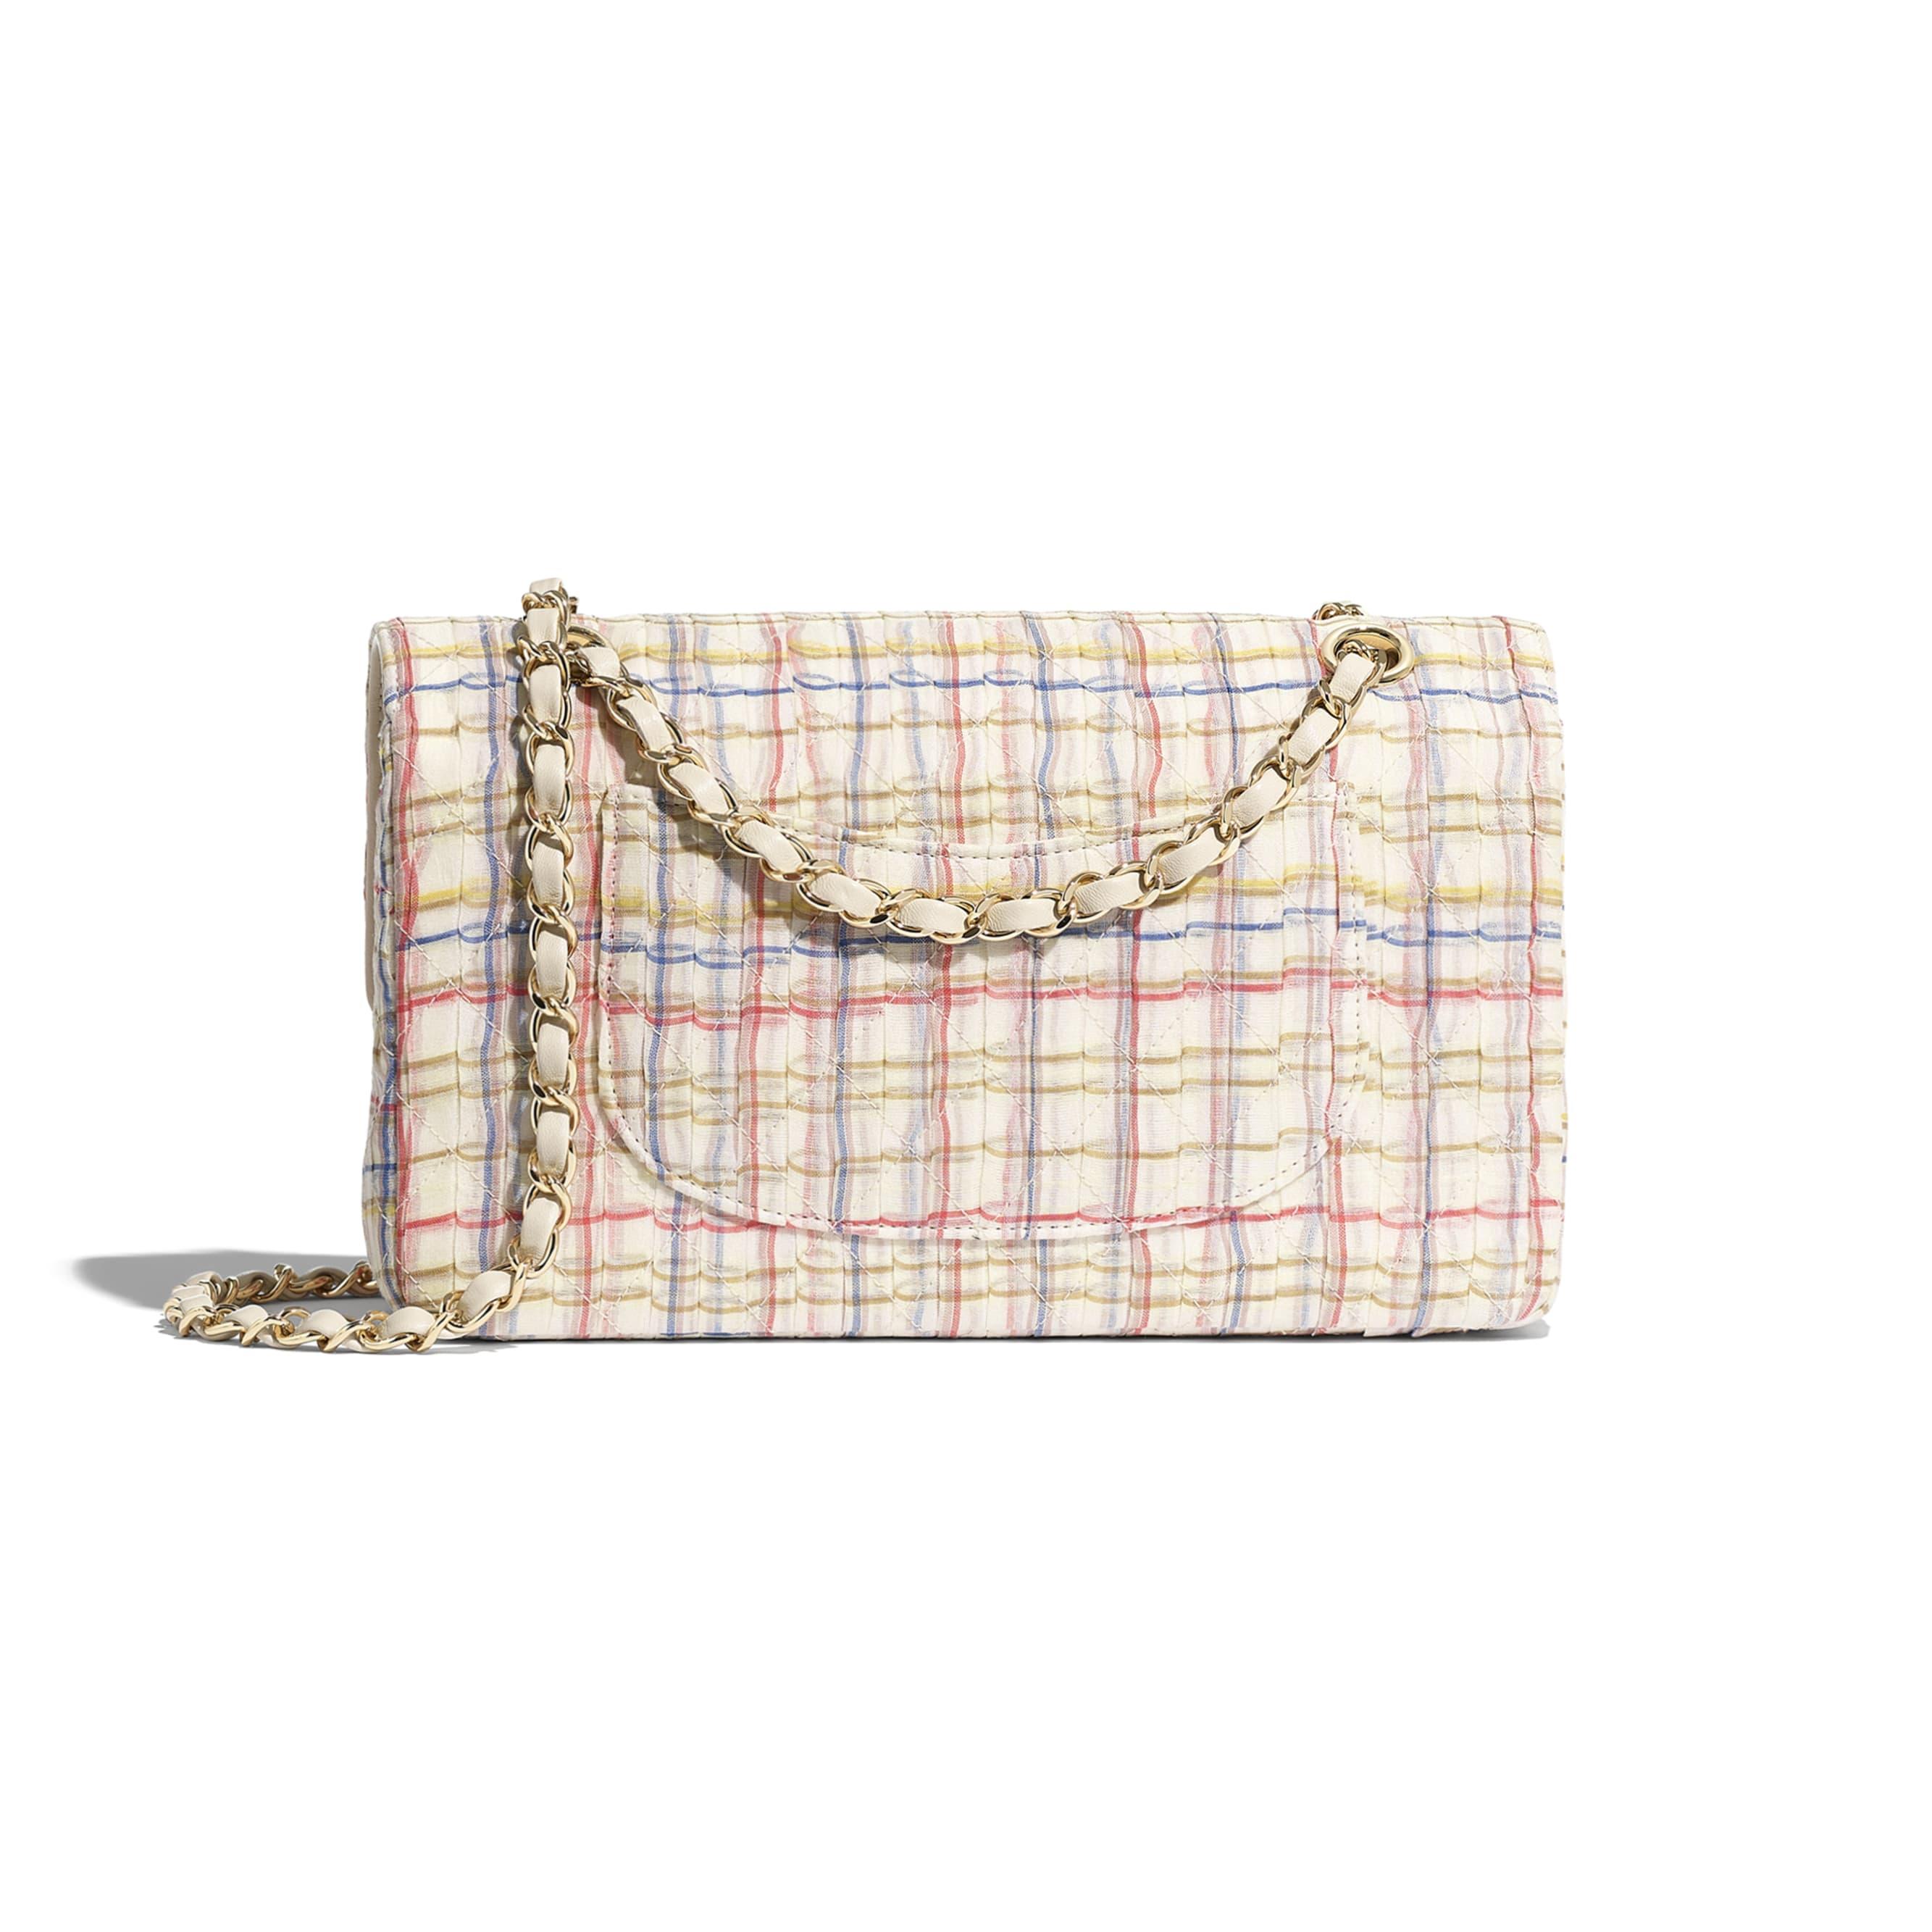 Classic Handbag - Ecru, Red, Blue & Yellow - Cotton, Silk, Calfskin & Gold-Tone Metal - Alternative view - see standard sized version